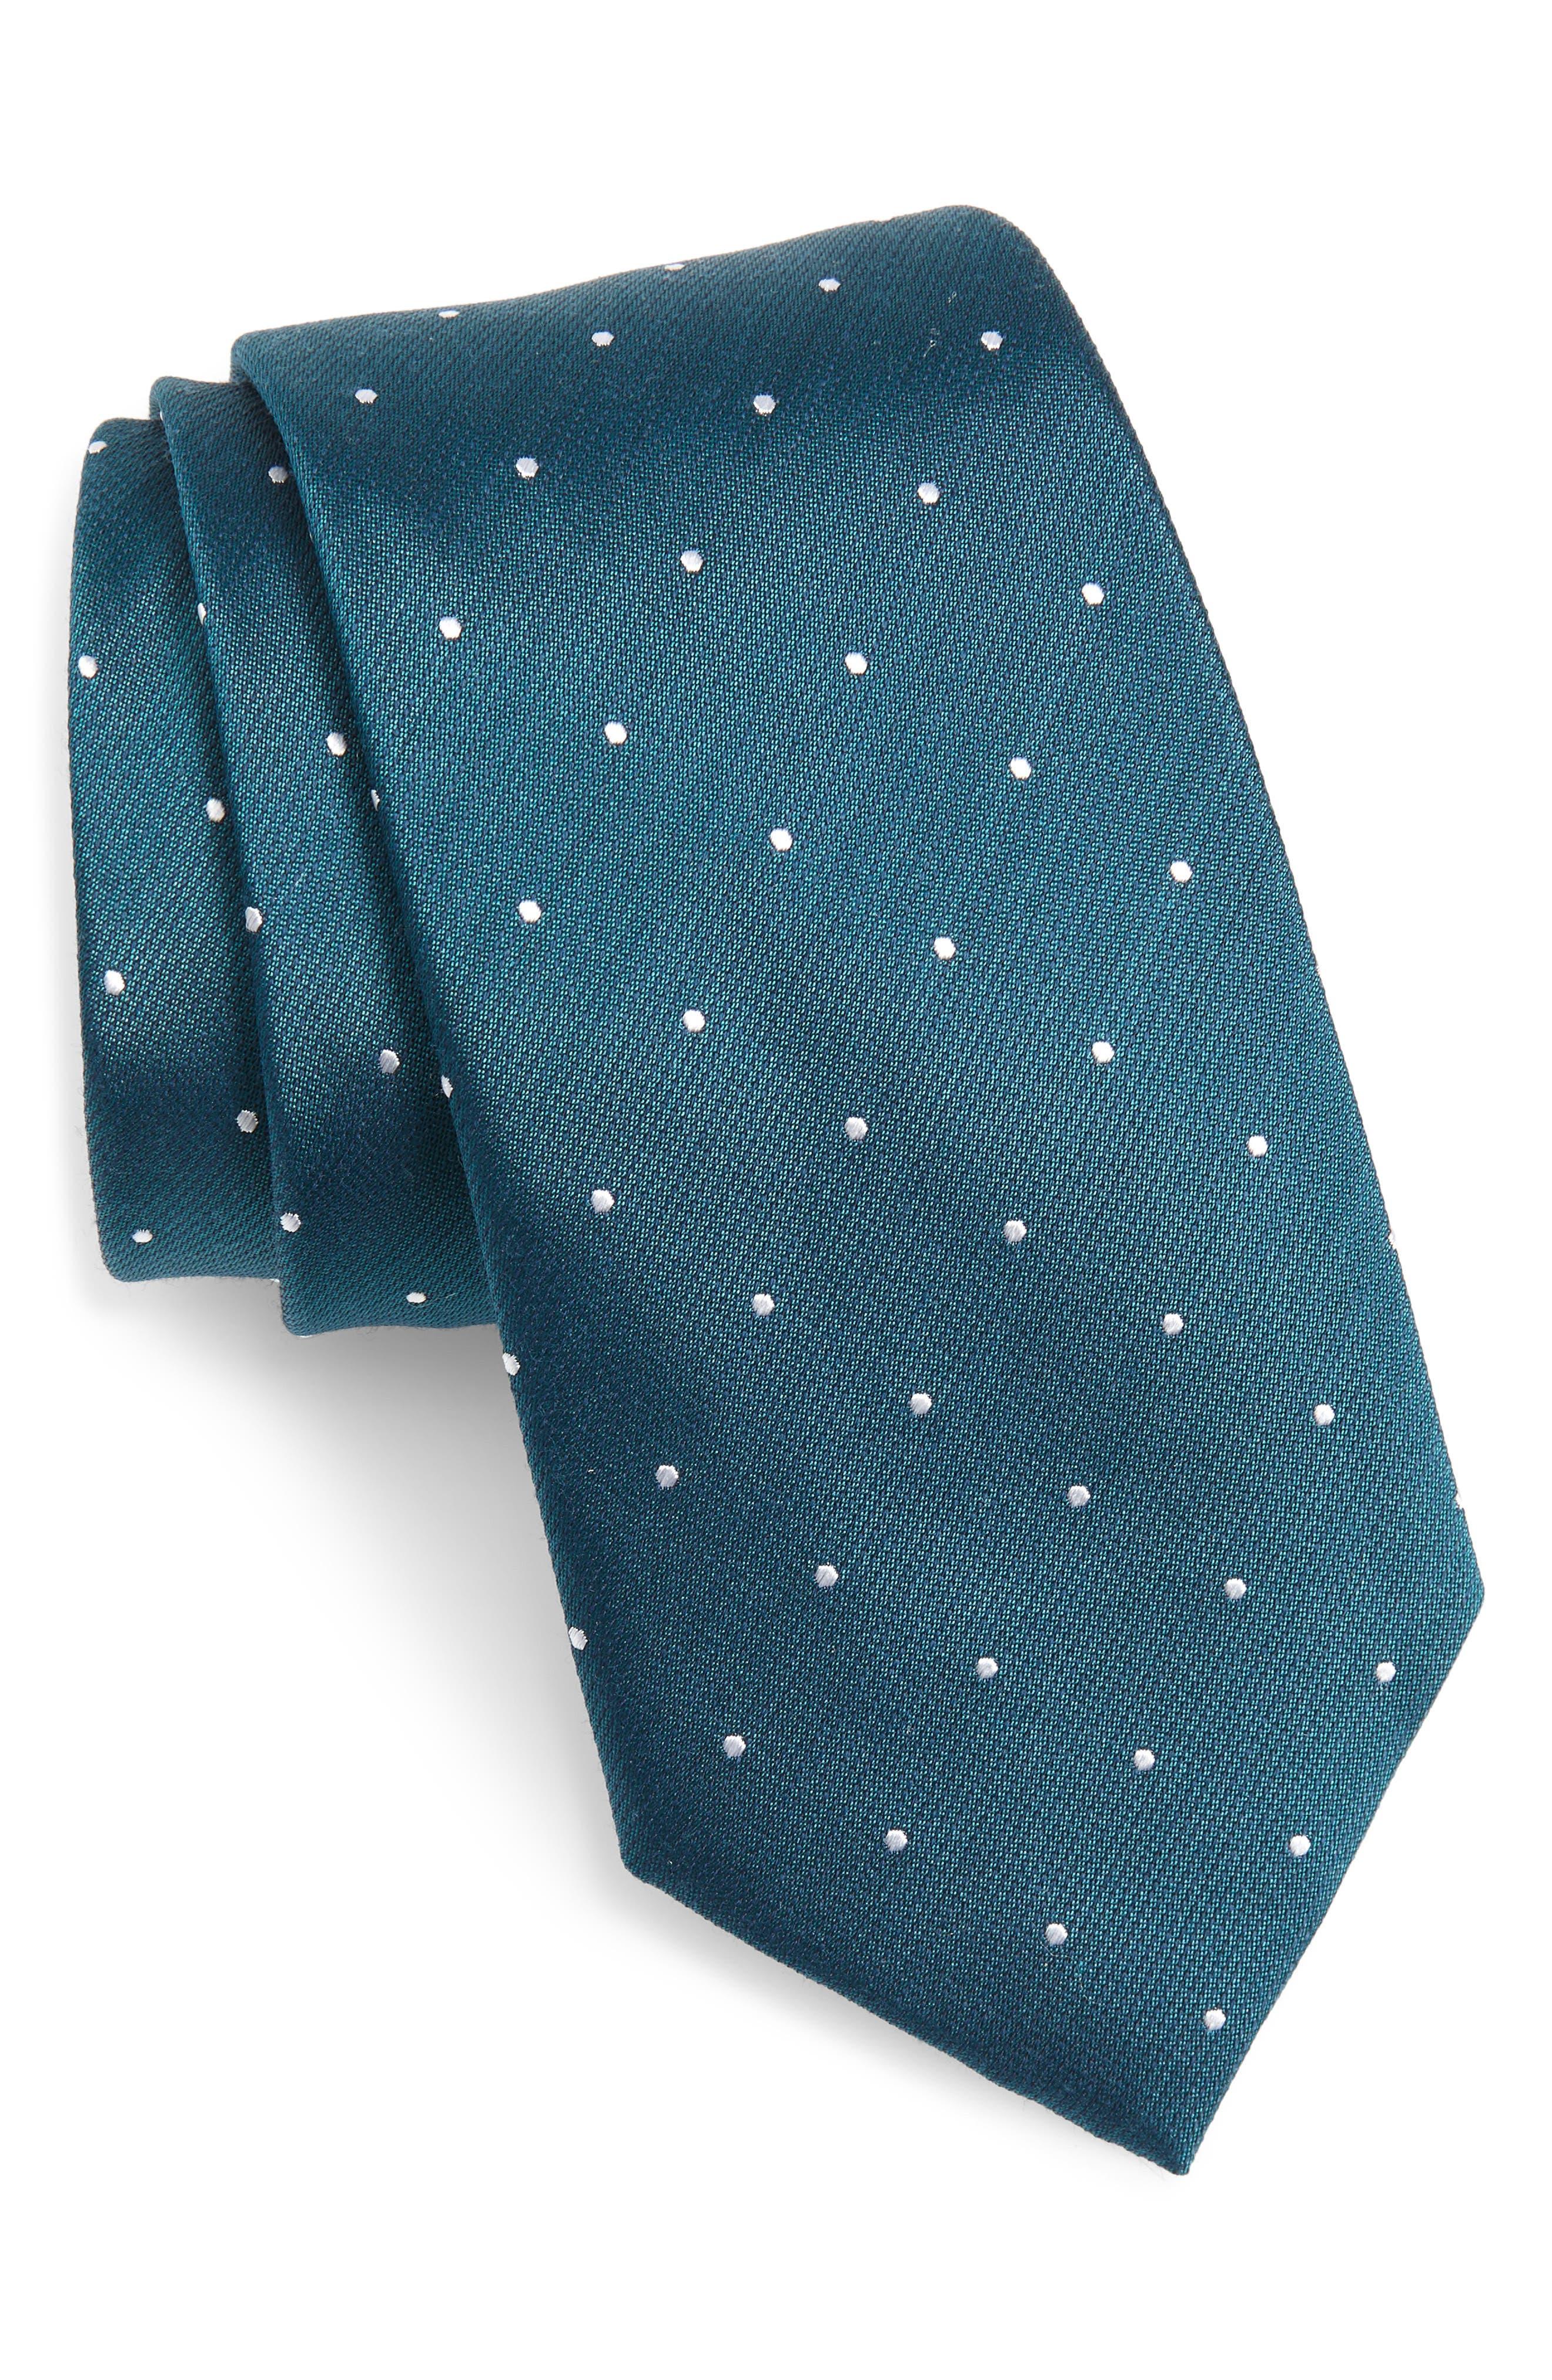 Dot Silk & Wool X-Long Tie,                             Main thumbnail 1, color,                             TEAL